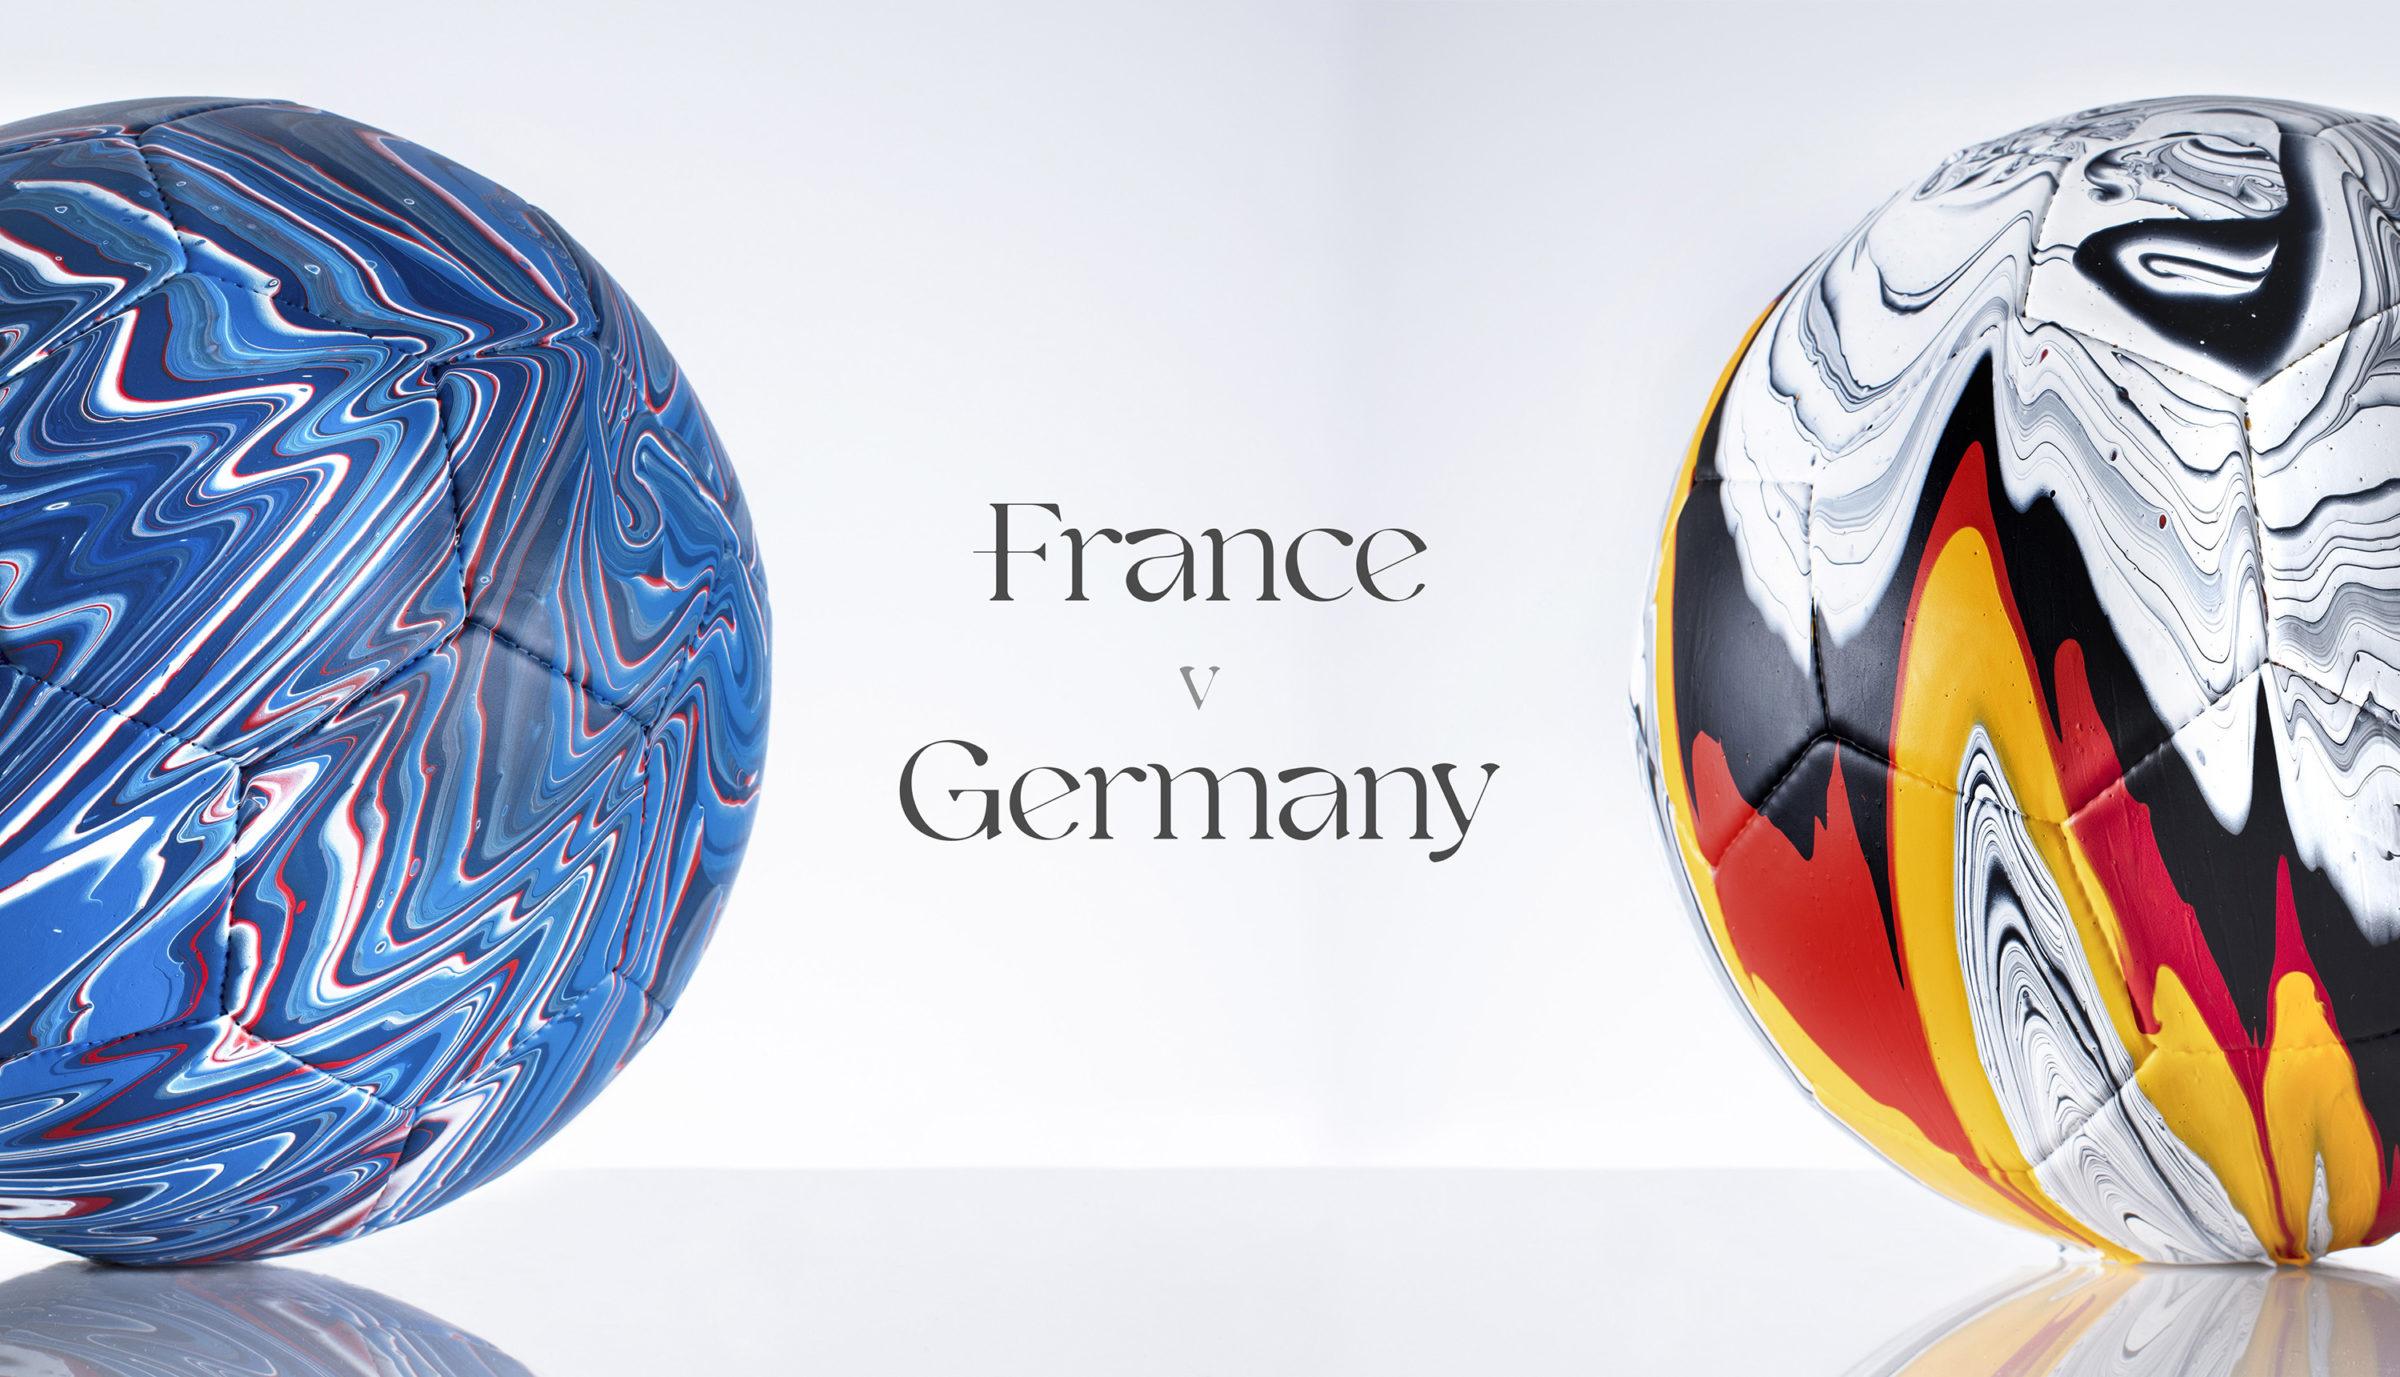 Craig Black x The Fusion Series Footballs Acrylic Fusion Football Art Installation 16 France v Germany